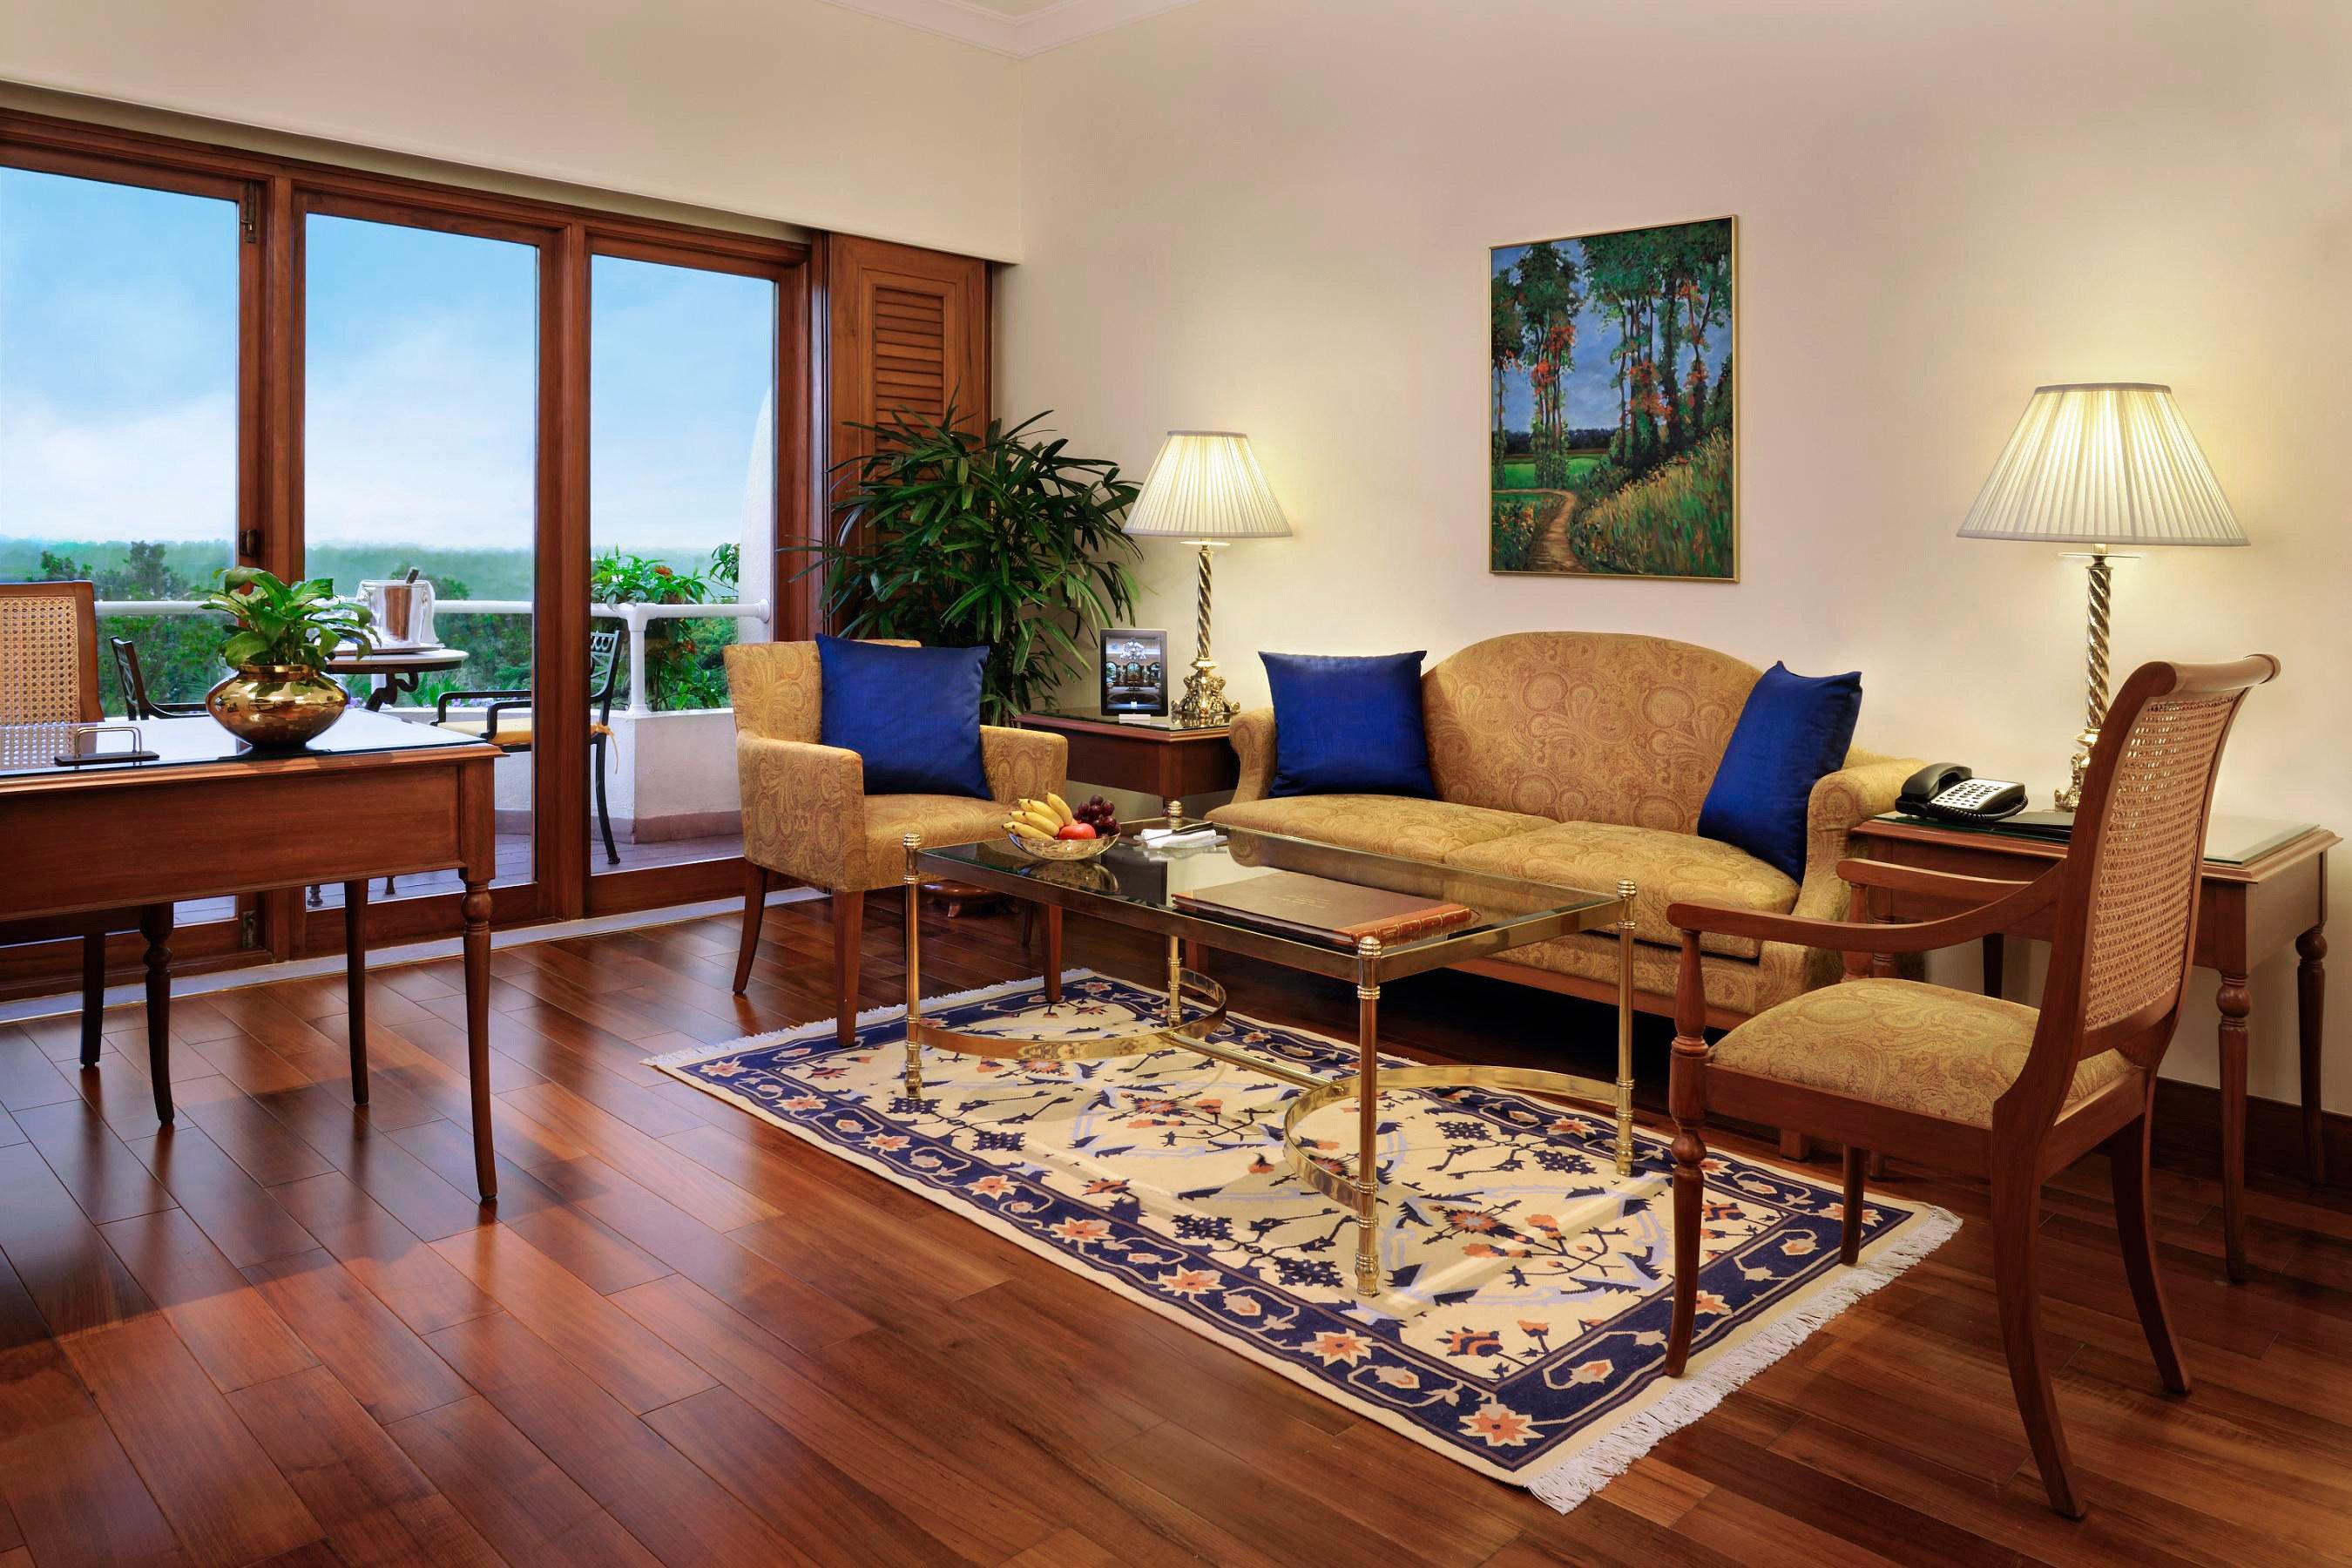 Business City Cultural Elegant Luxury Shop property chair living room hardwood home condominium cottage wood flooring Villa laminate flooring rug